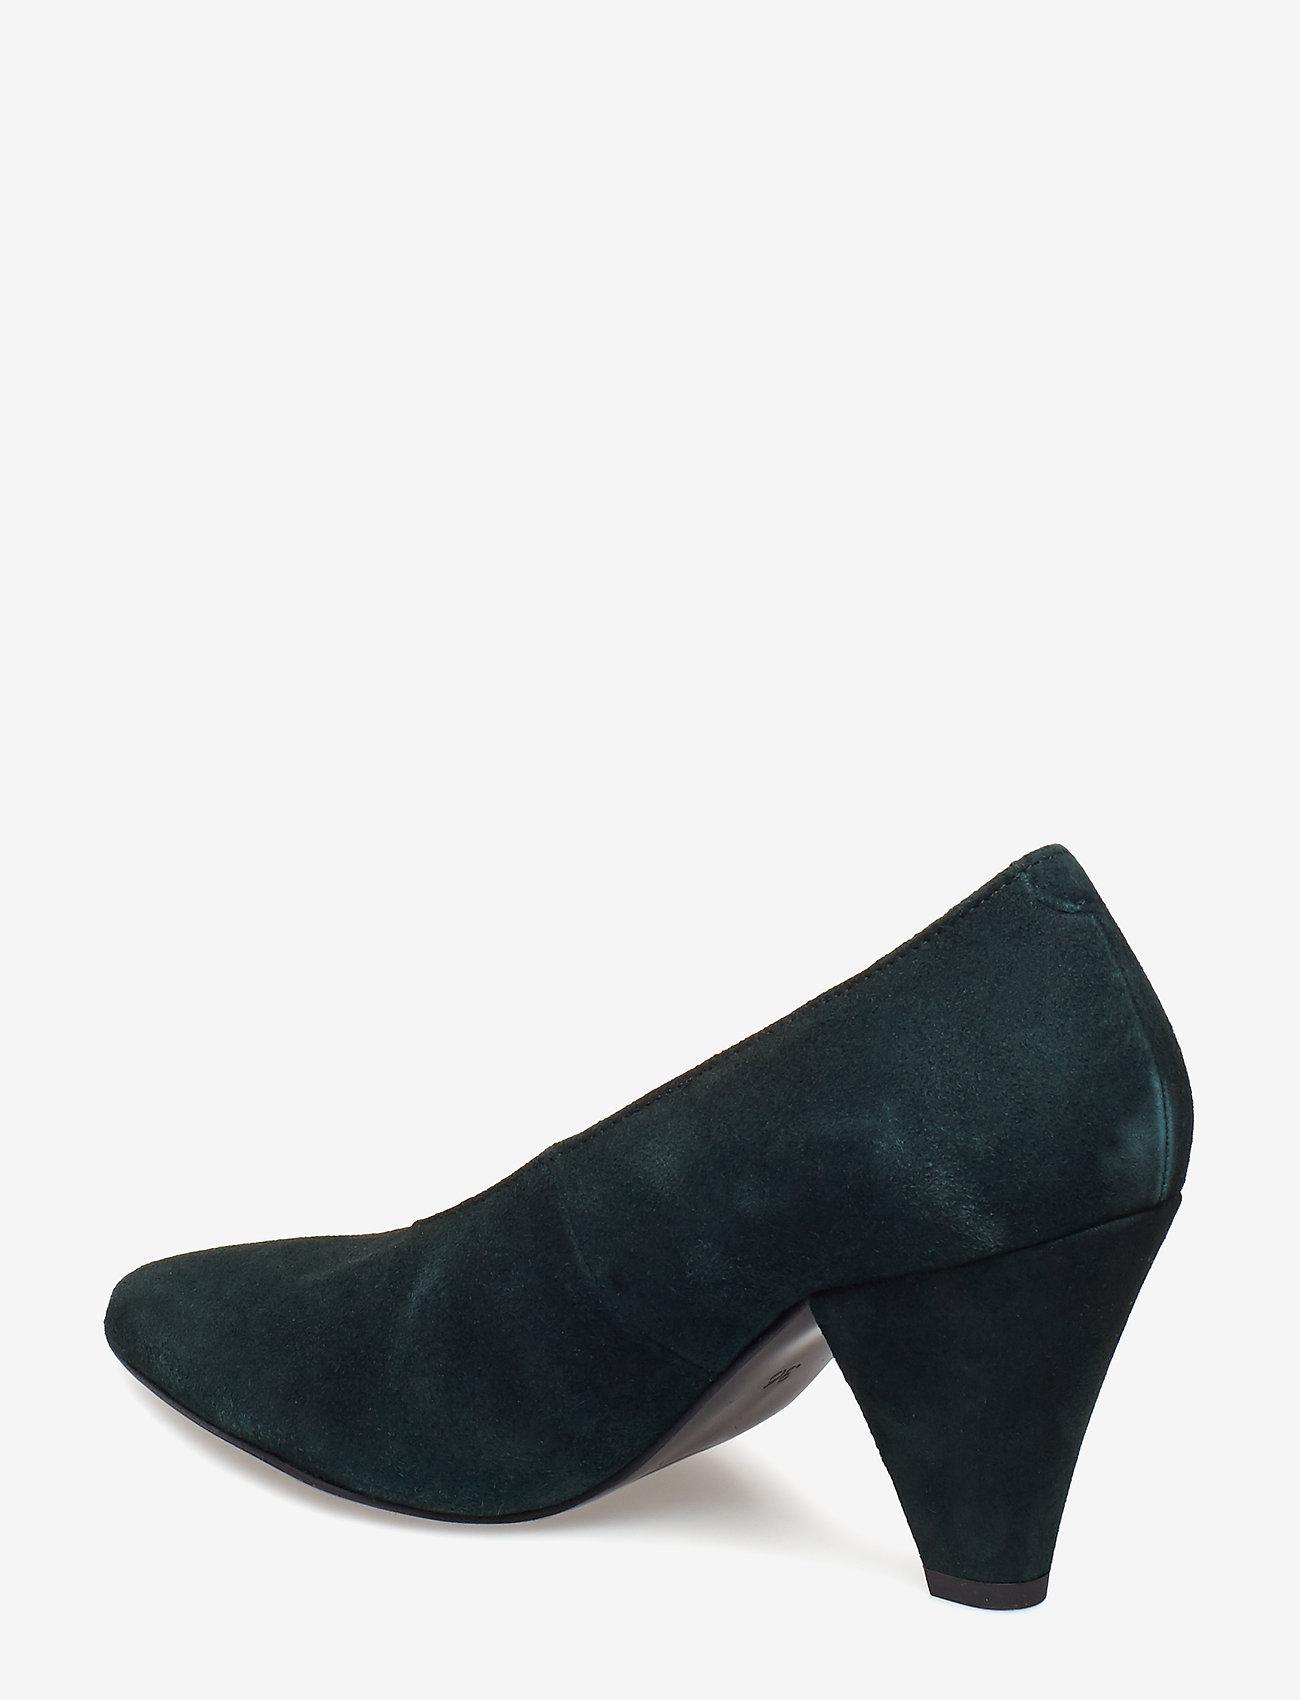 Rio Heels Blackish Green (Green) (639.60 kr) - Twist & Tango